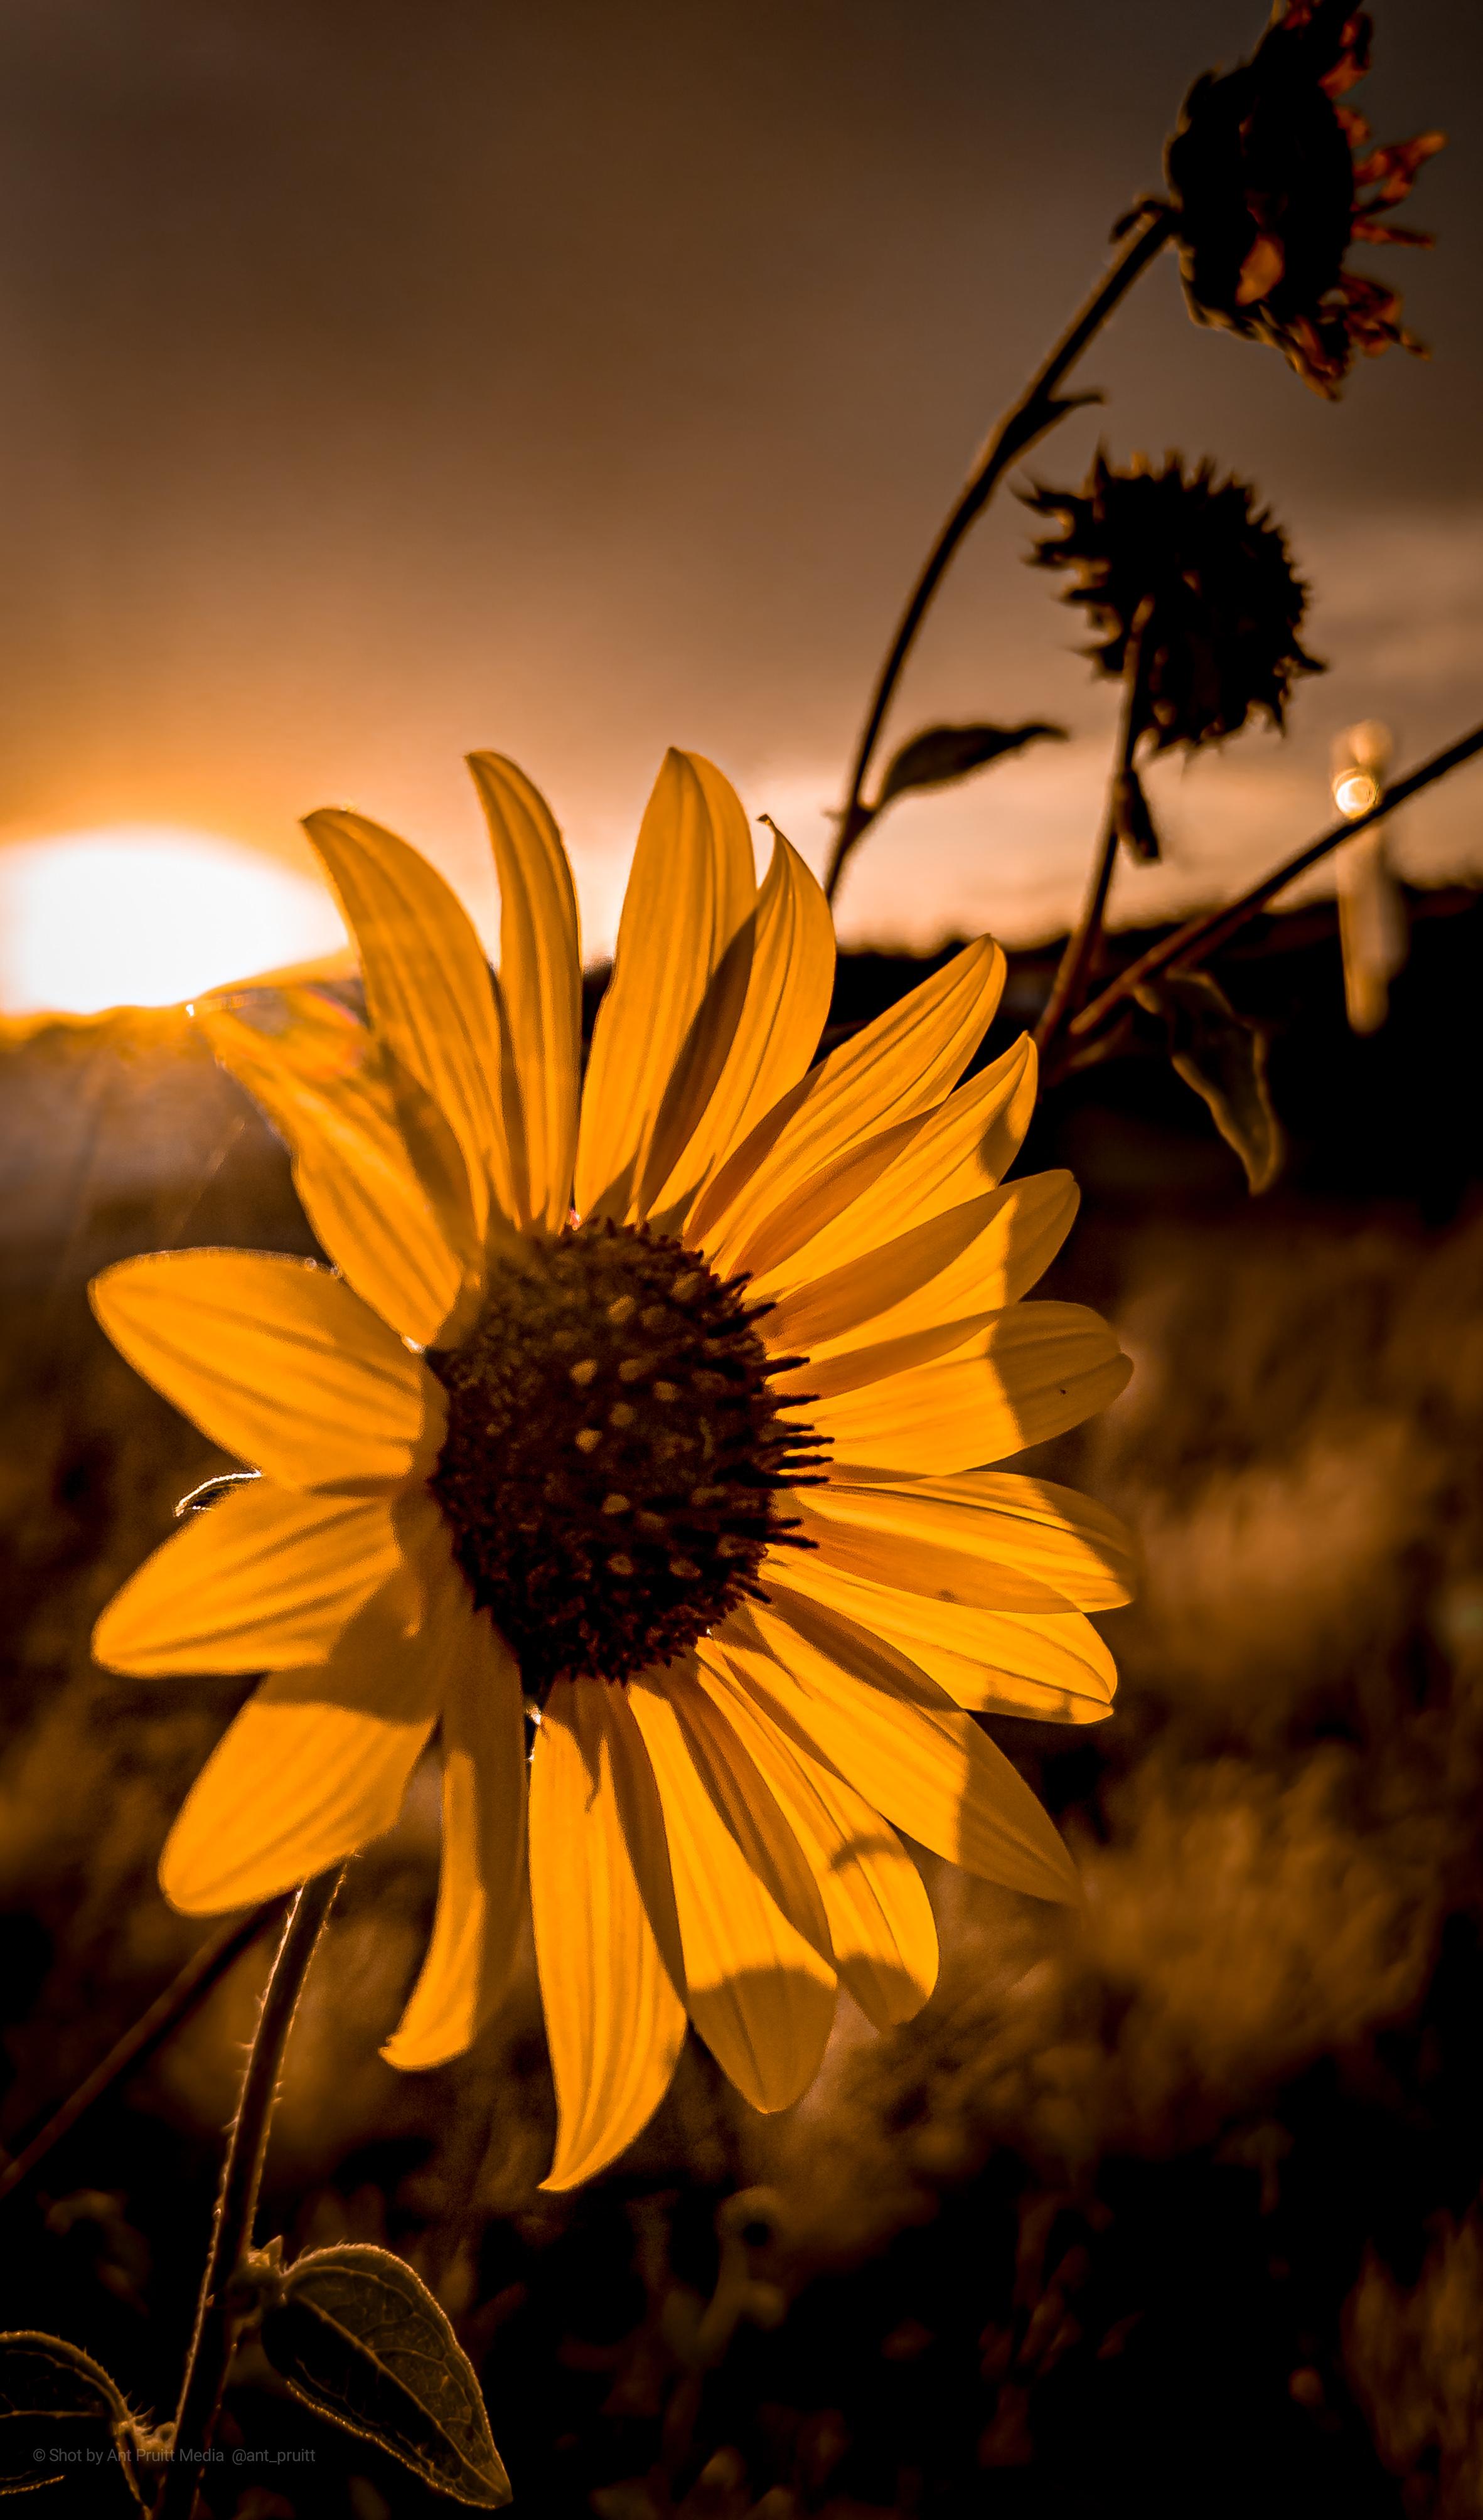 desert-sunset-in-arizona.jpeg